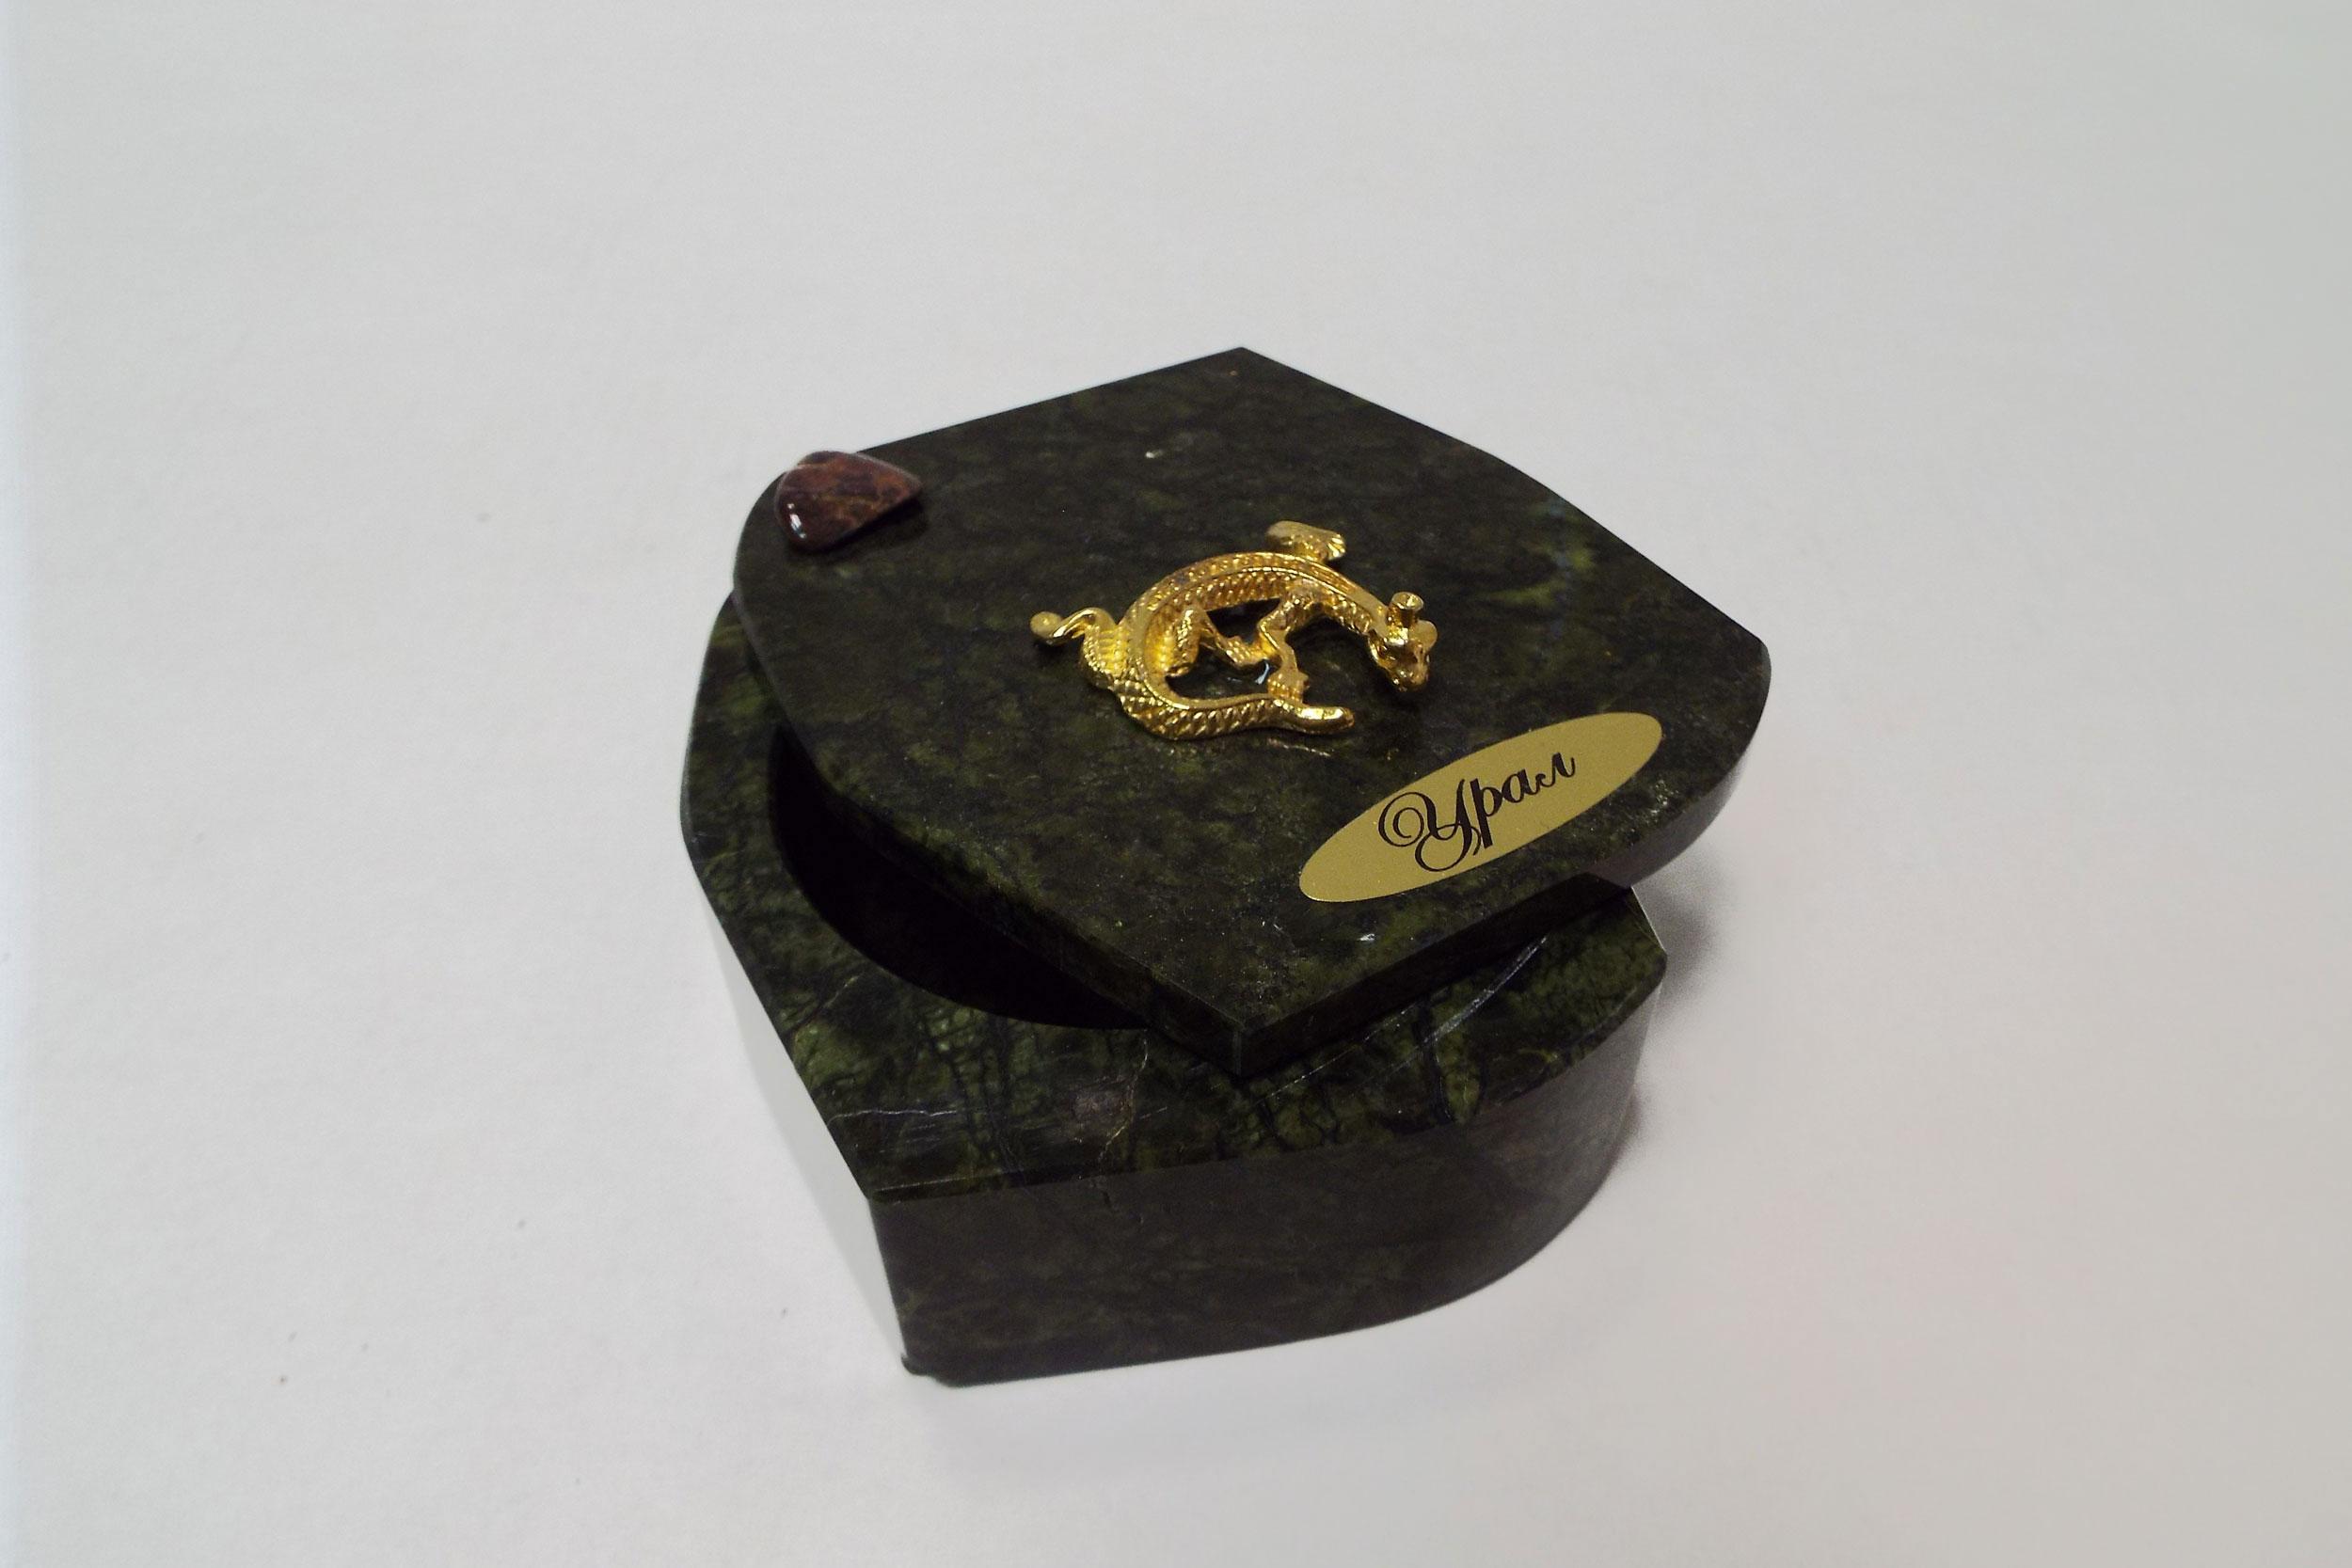 Шкатулка из змеевика с крышкой на штырьке